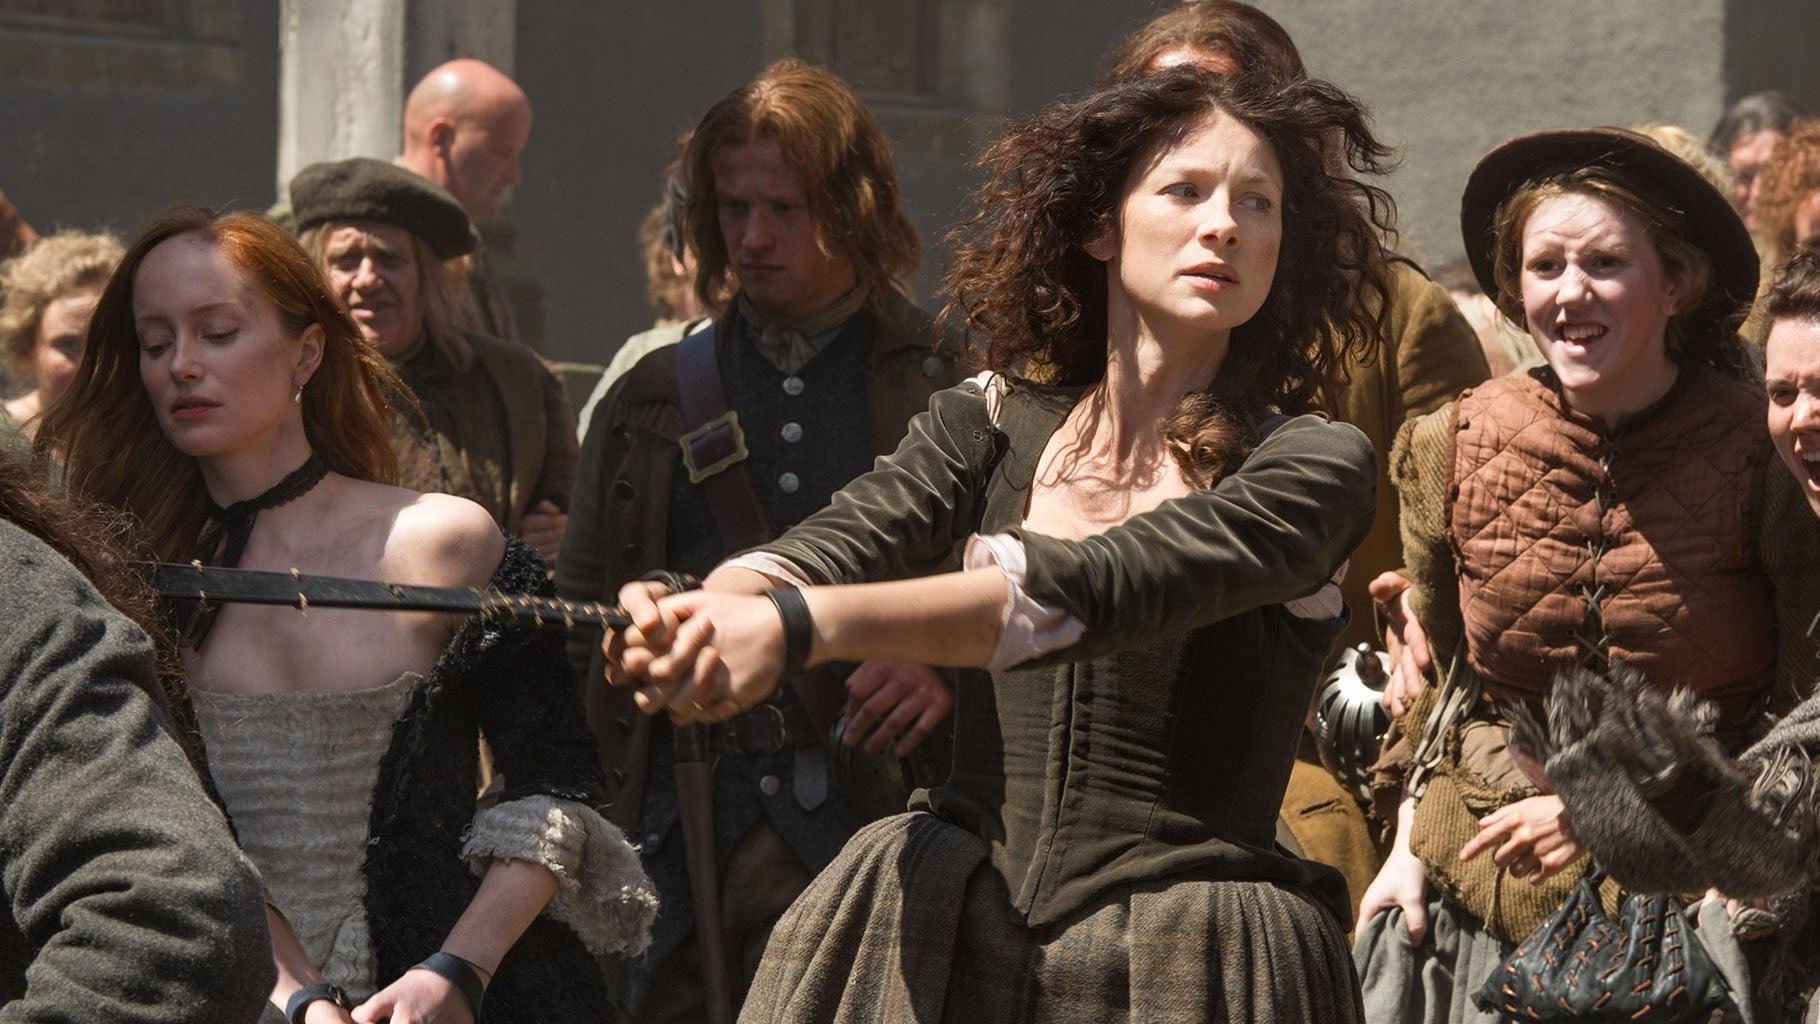 Outlander Season 3 Episode 4 Watch Online: How To Stream